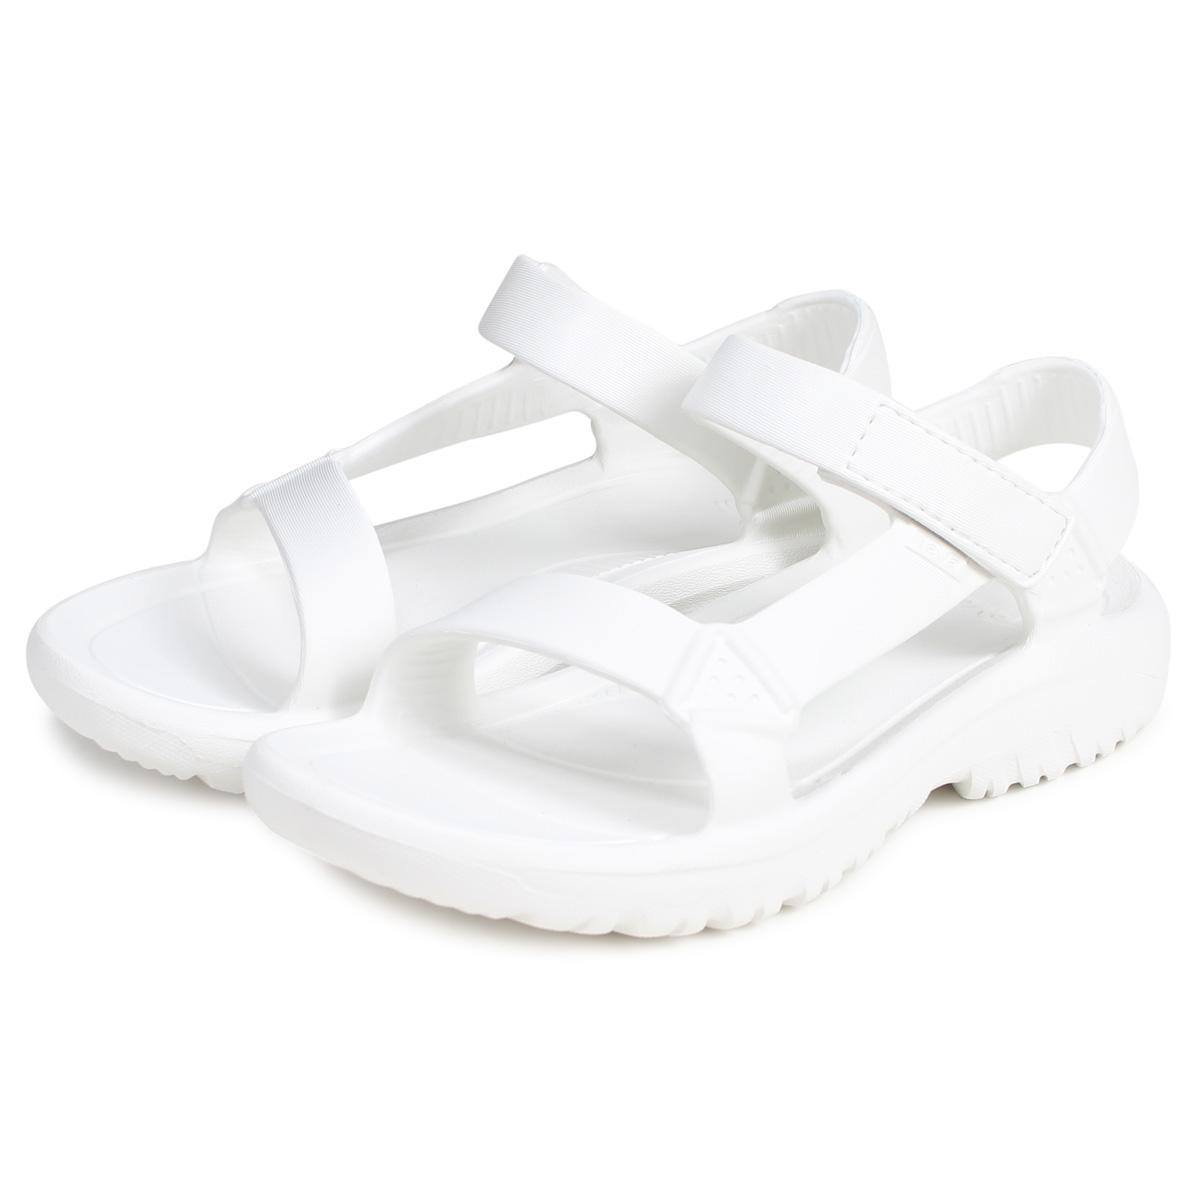 3067ff23eac9 Teva HURRICANE DRIFT Teva sandals hurricane Lady s men black white black  and white 1102390  load planned Shinnyu load in reservation product 3 13 ...